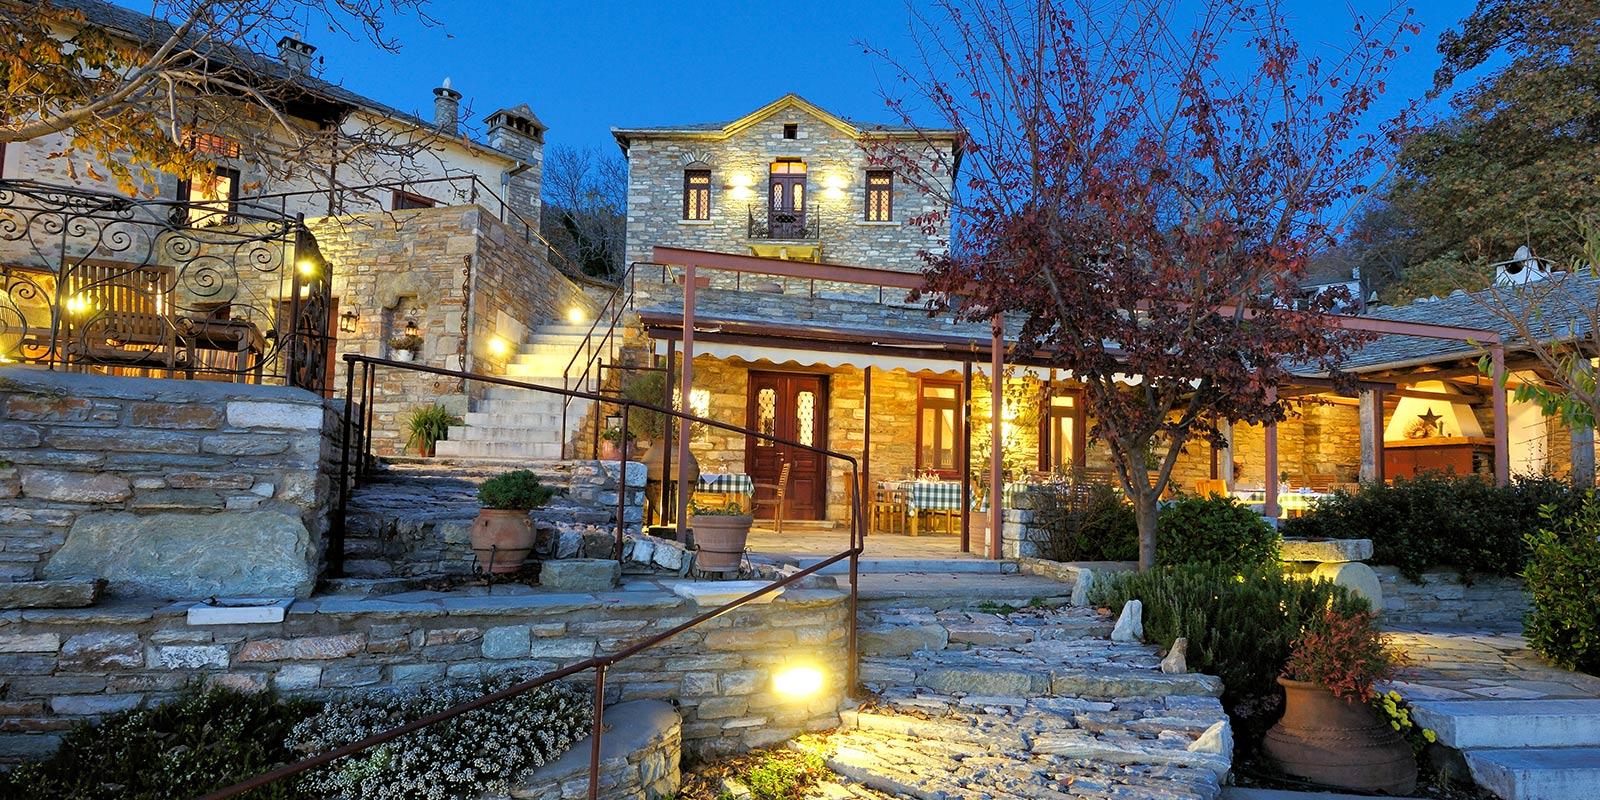 Anovolios Boutique Hotel: Πήλιο, Άγιος Γεώργιος Νηλείας, Θεσσαλία, Ελλάδα